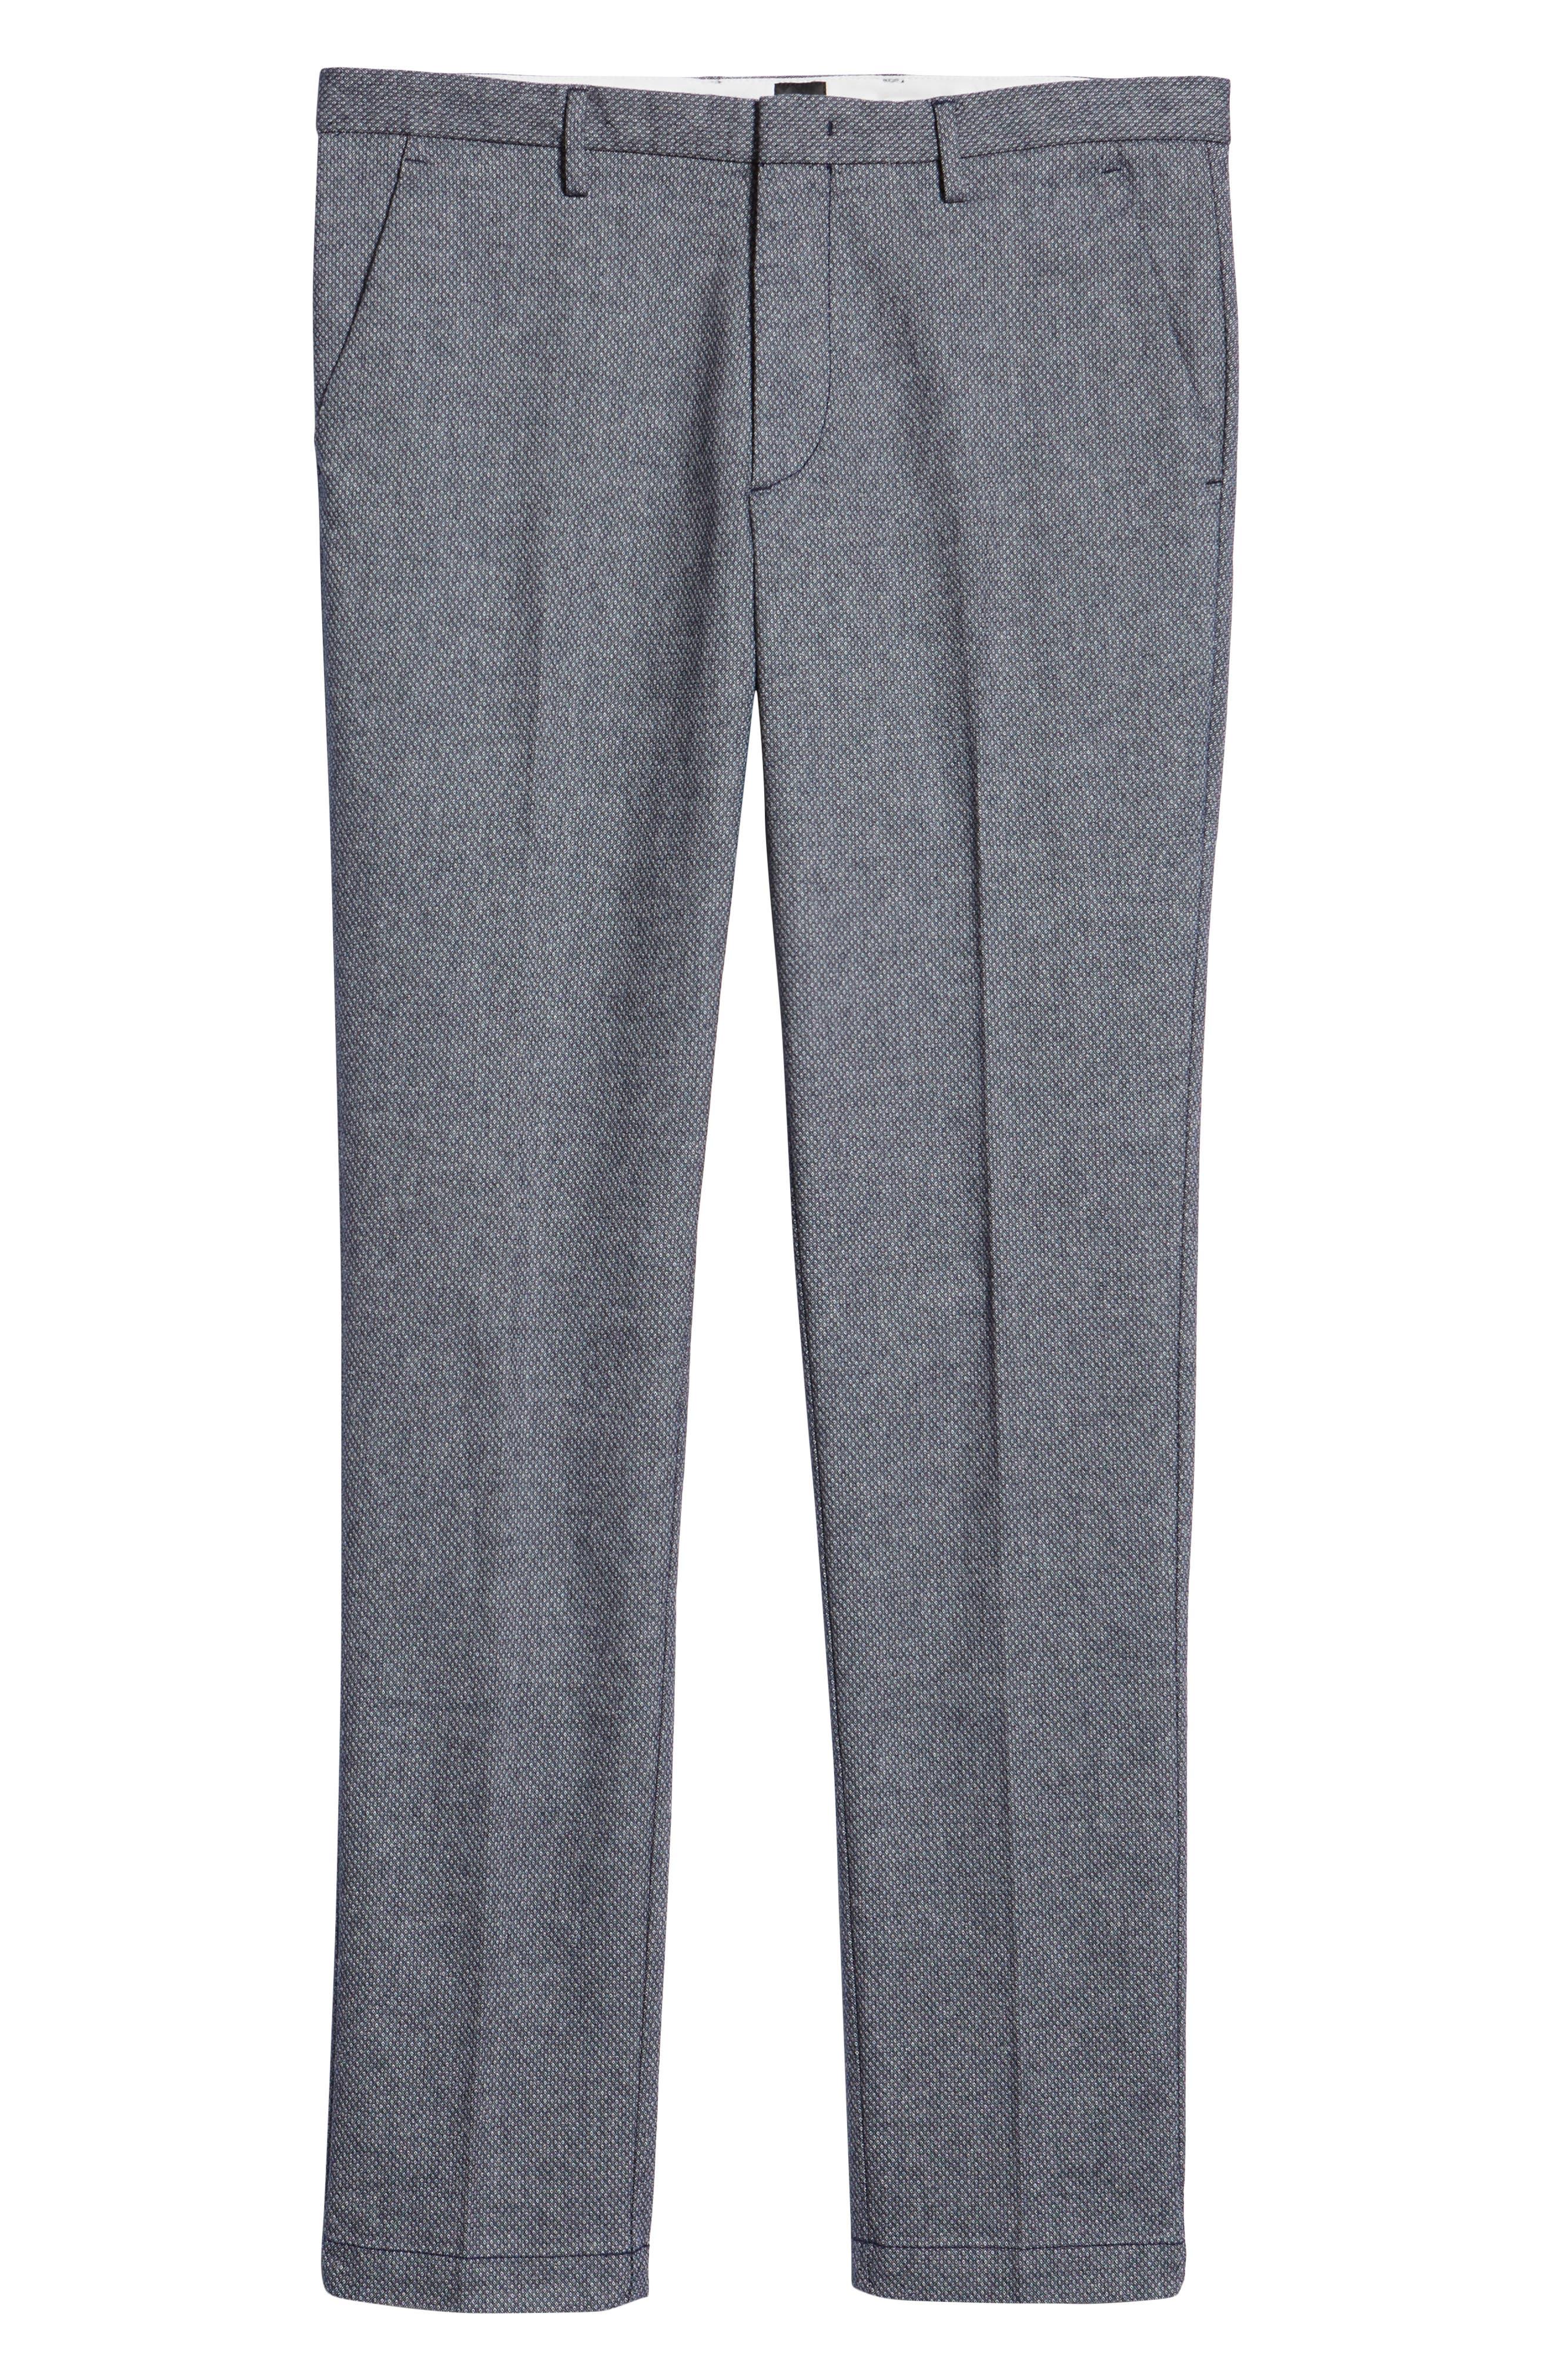 Kaito Slim Fit Pants,                             Alternate thumbnail 6, color,                             NAVY